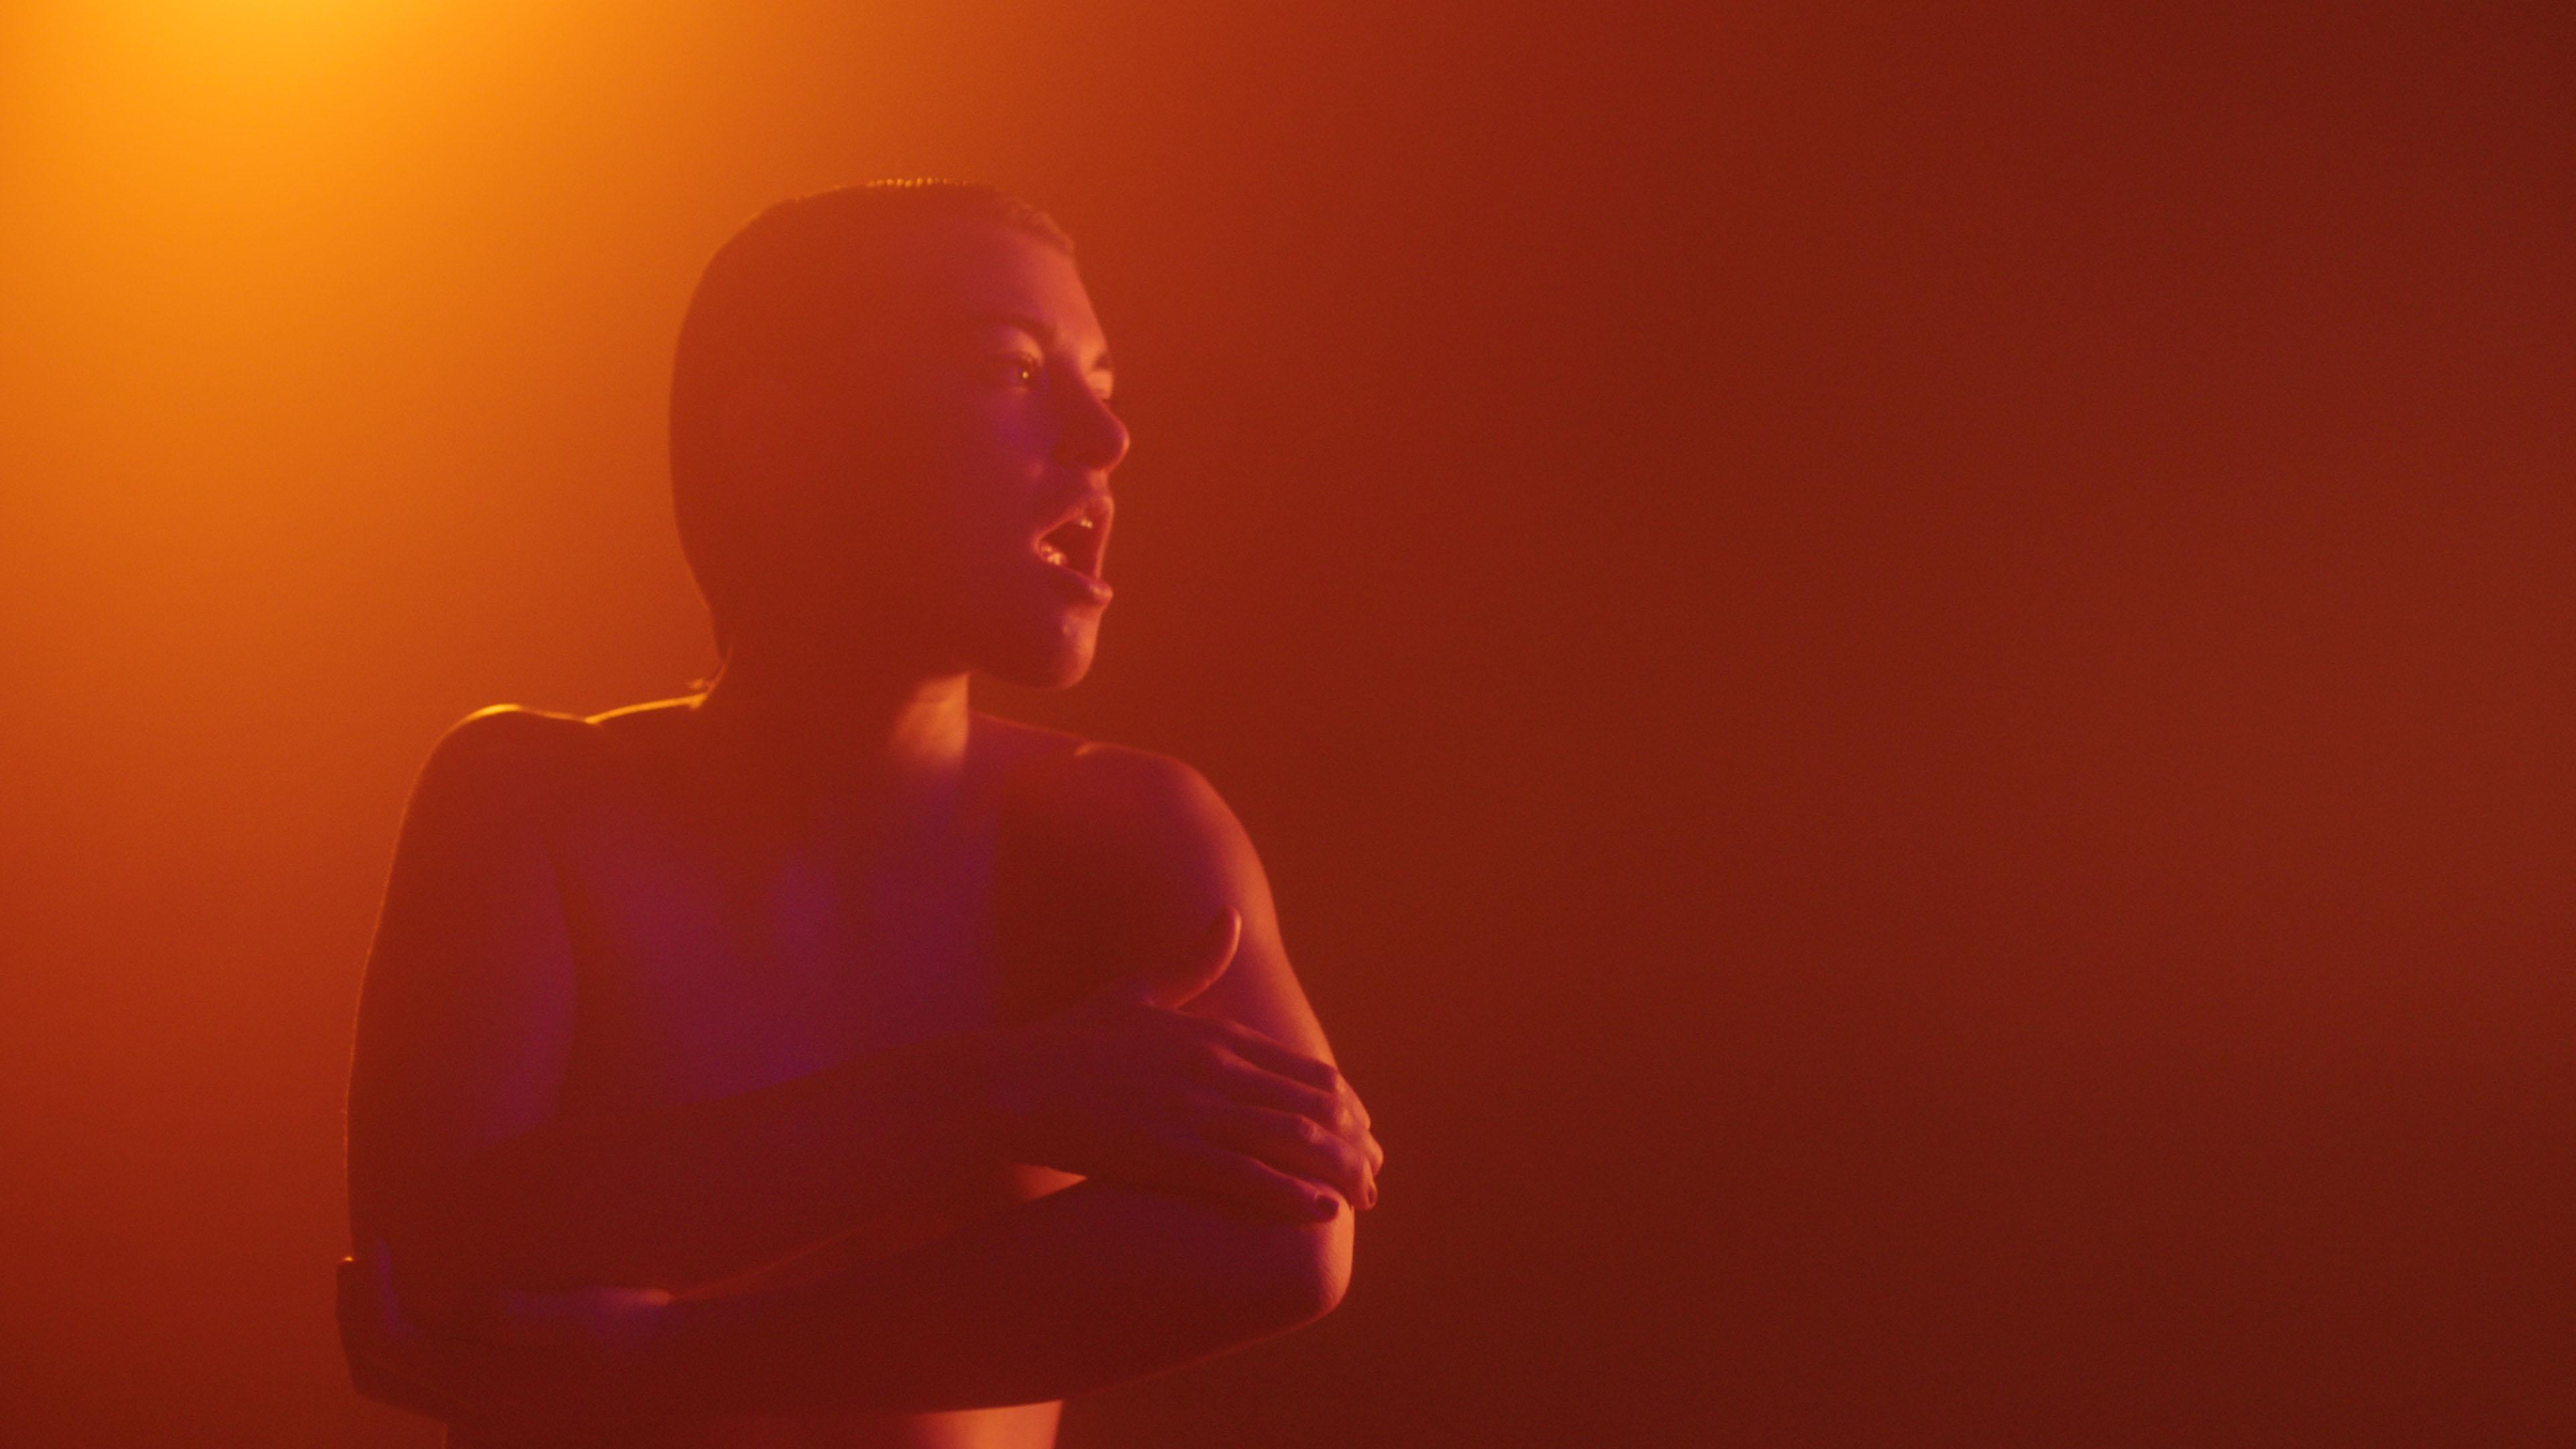 Michael Portnoy, Progressive Touch: Series 1, video still